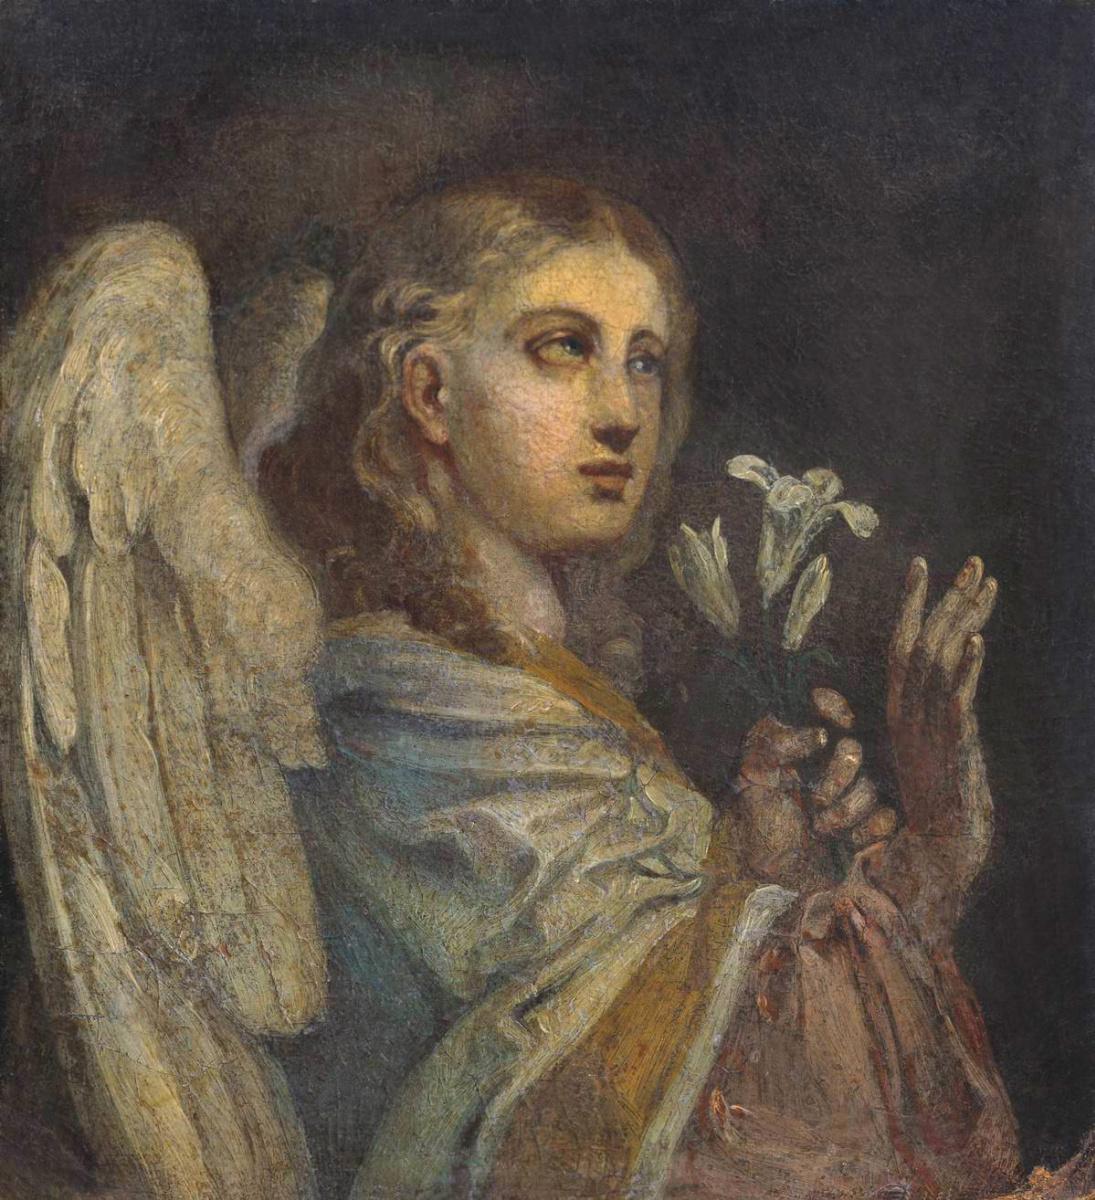 Vladimir Lukich Borovikovsky. Archangel Gabriel